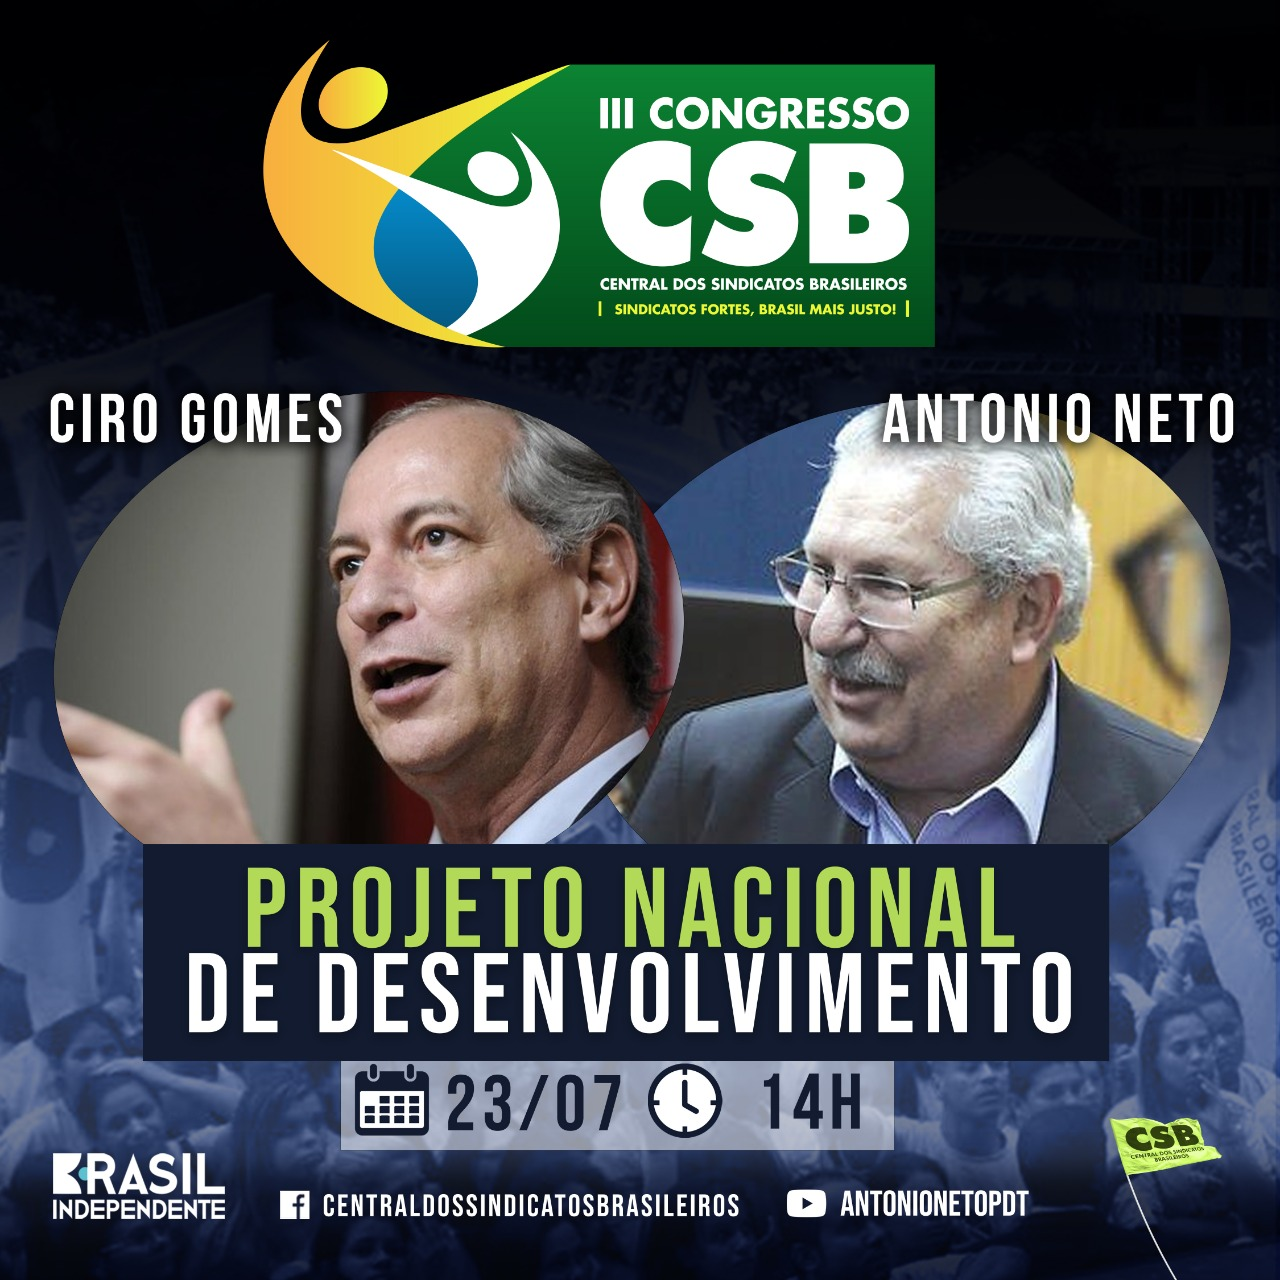 Junte-se a Ciro Gomes e Antonio Neto nos seminários CSB – Vagas Limitadas!